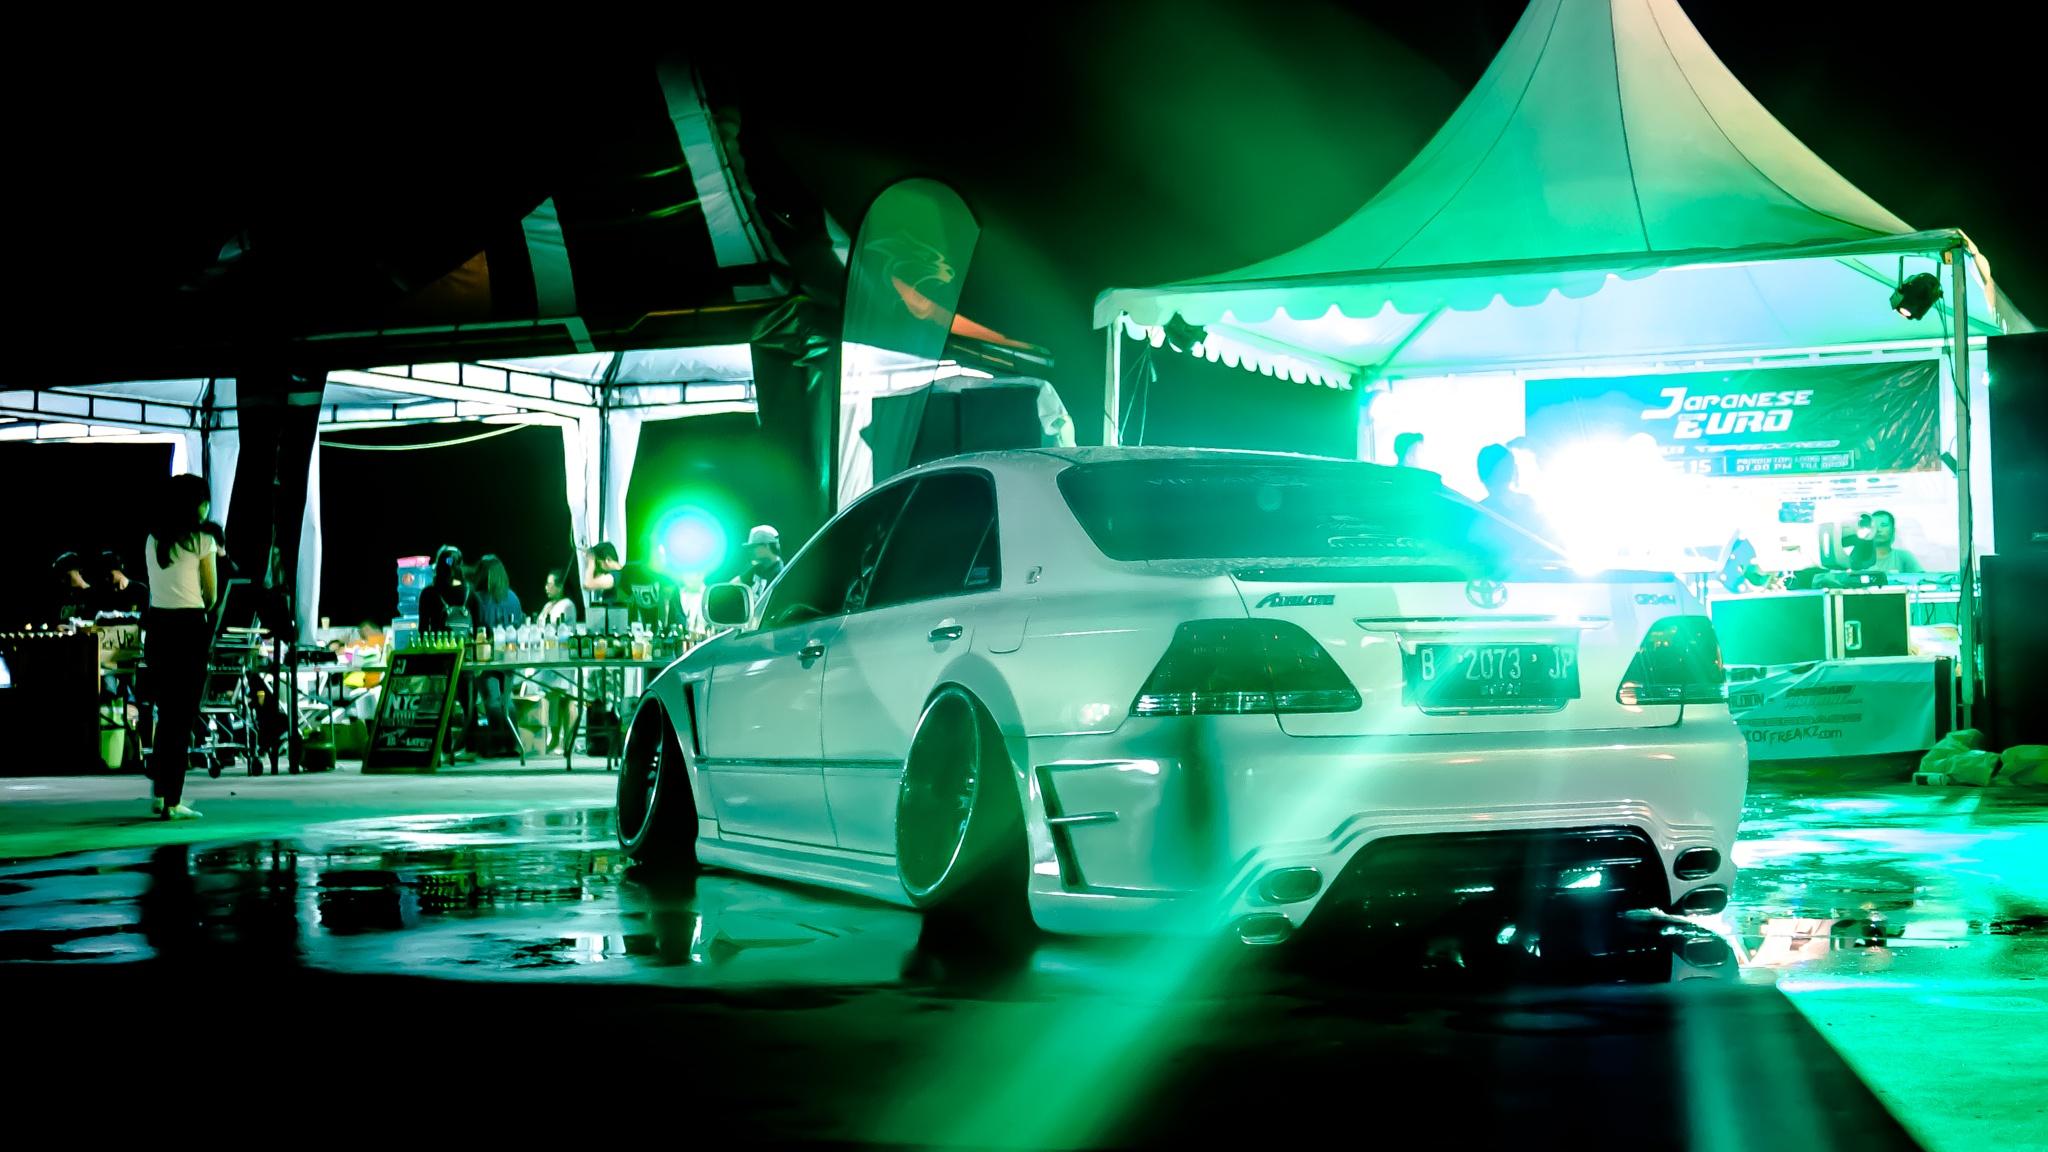 Nite Car Meet by gettinlow